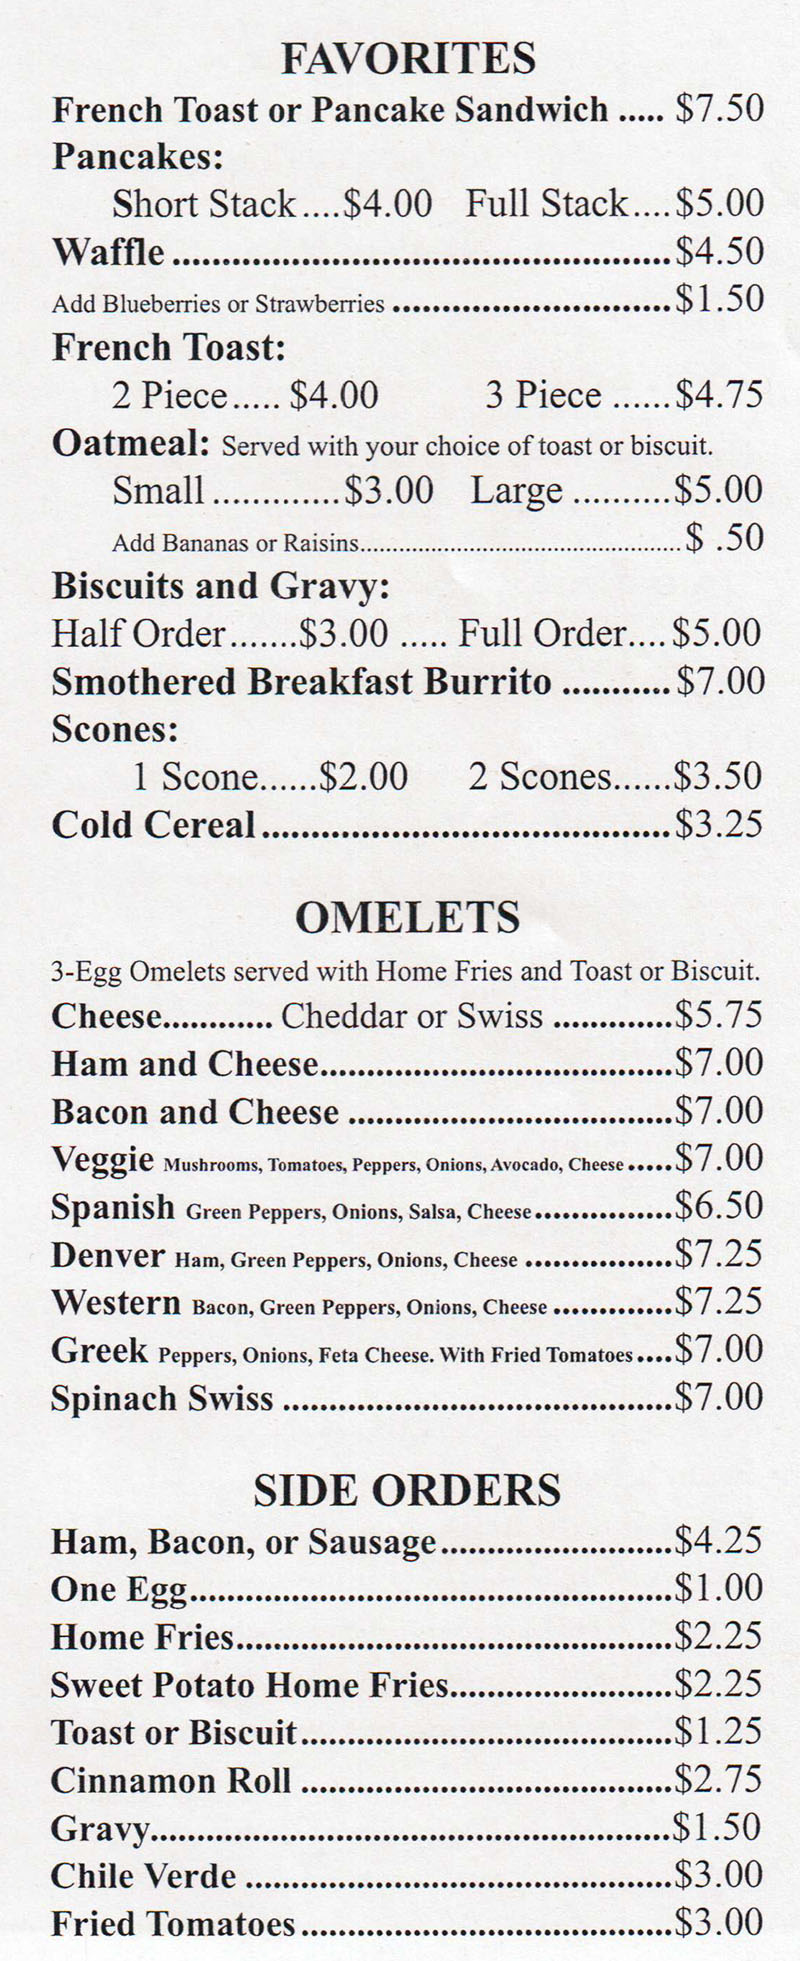 Sharon's Cafe Breakfast Favorites Menu